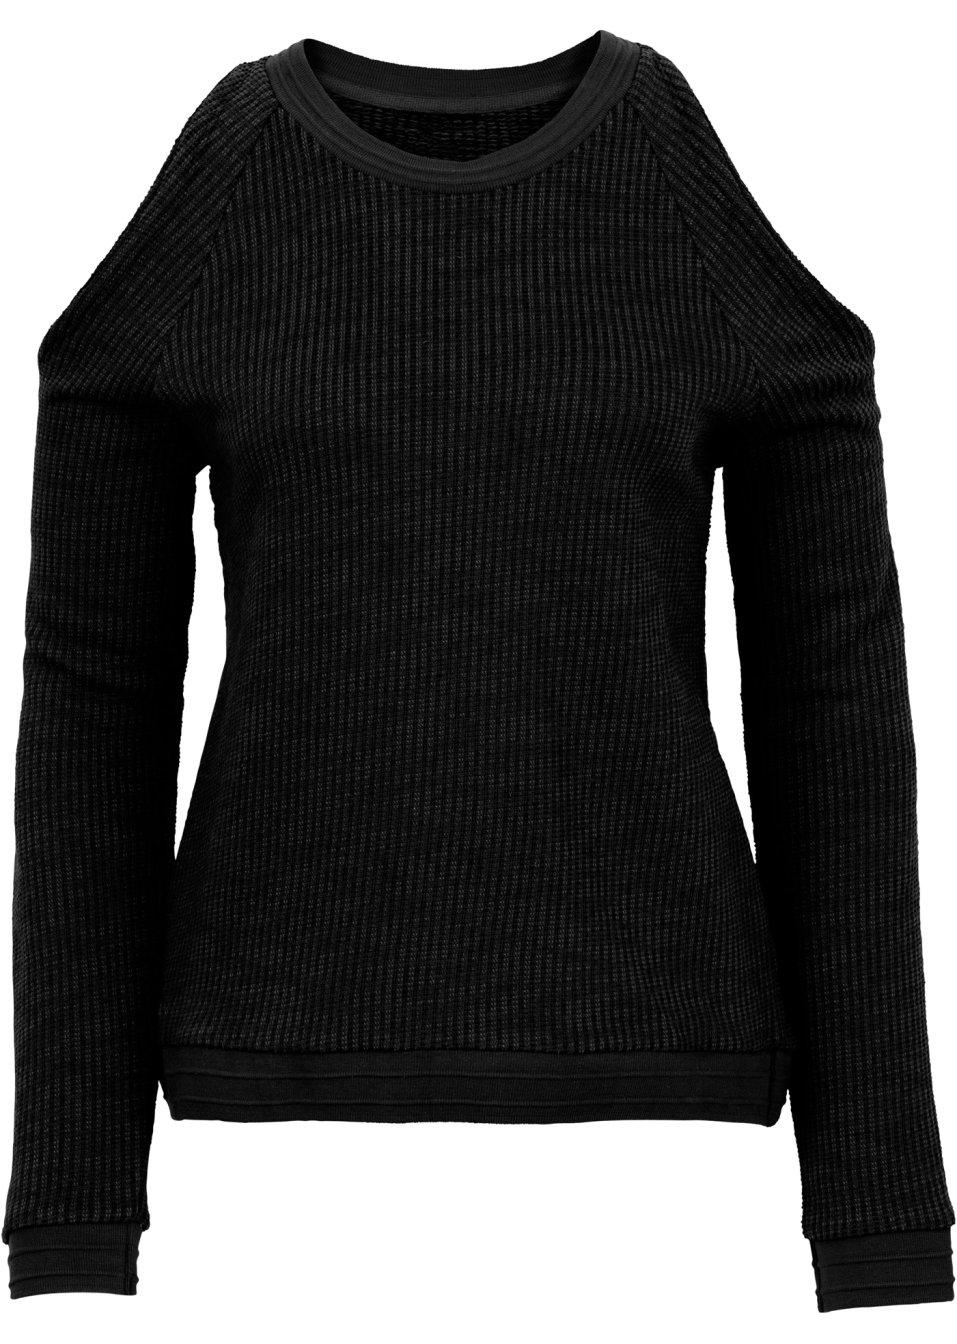 legerer pullover mit cut outs und rippb ndchen schwarz. Black Bedroom Furniture Sets. Home Design Ideas